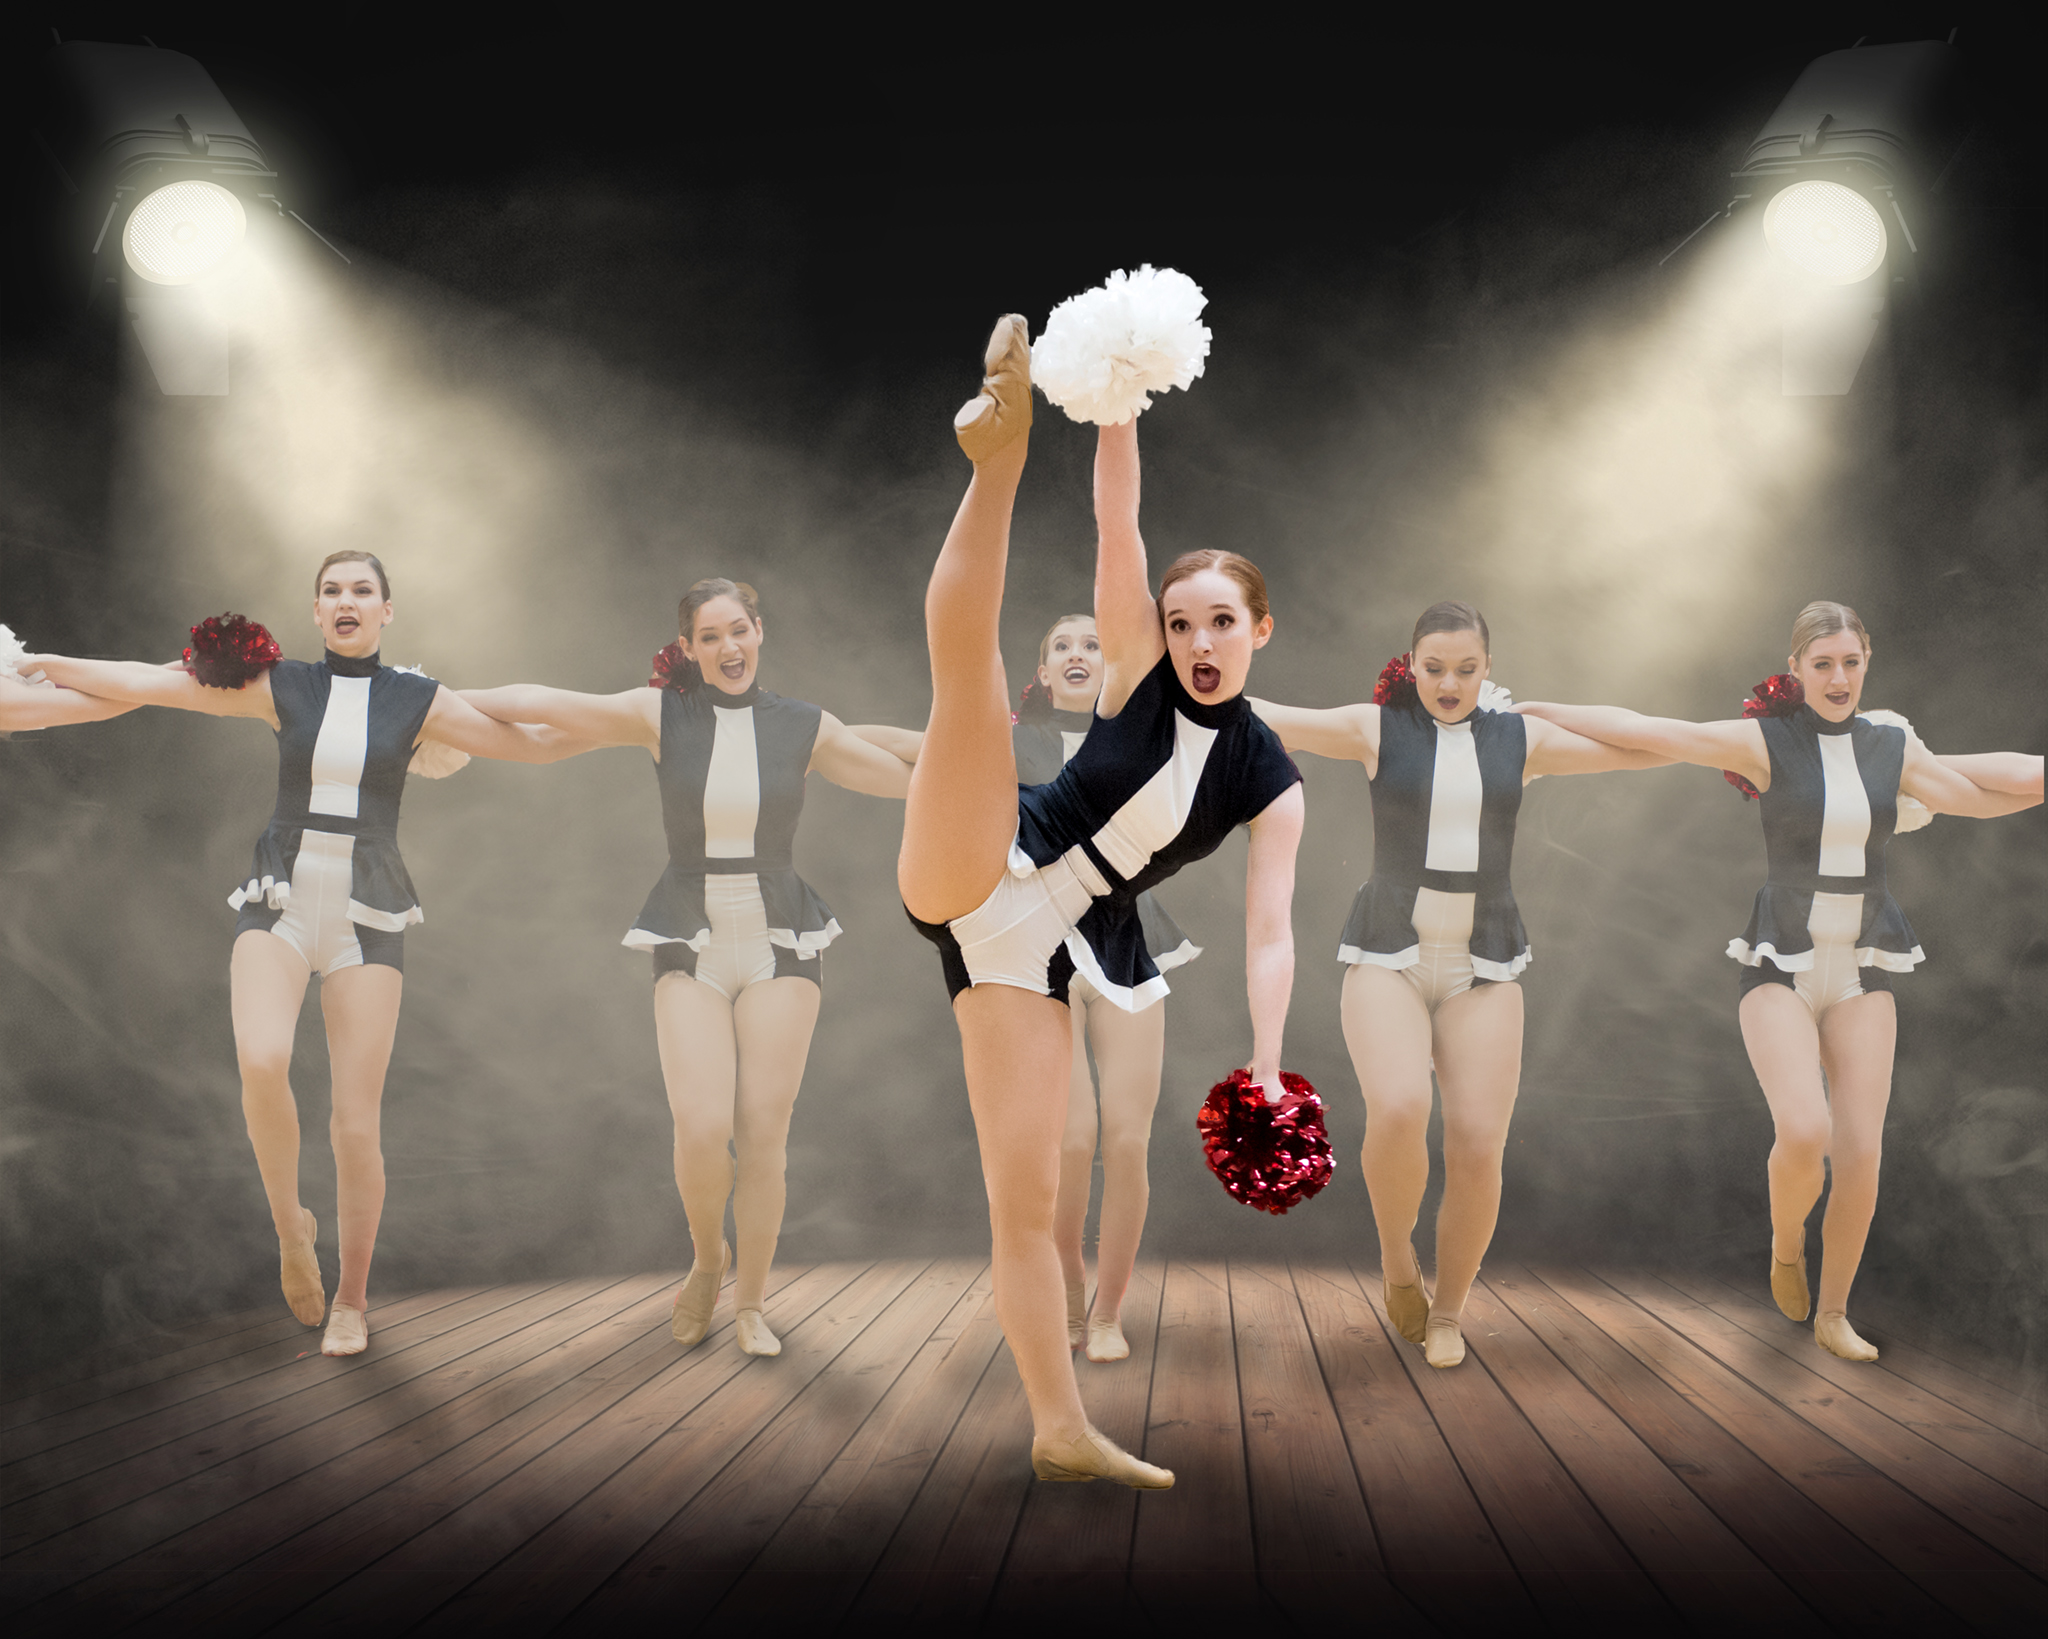 cls dance composite sm.jpg